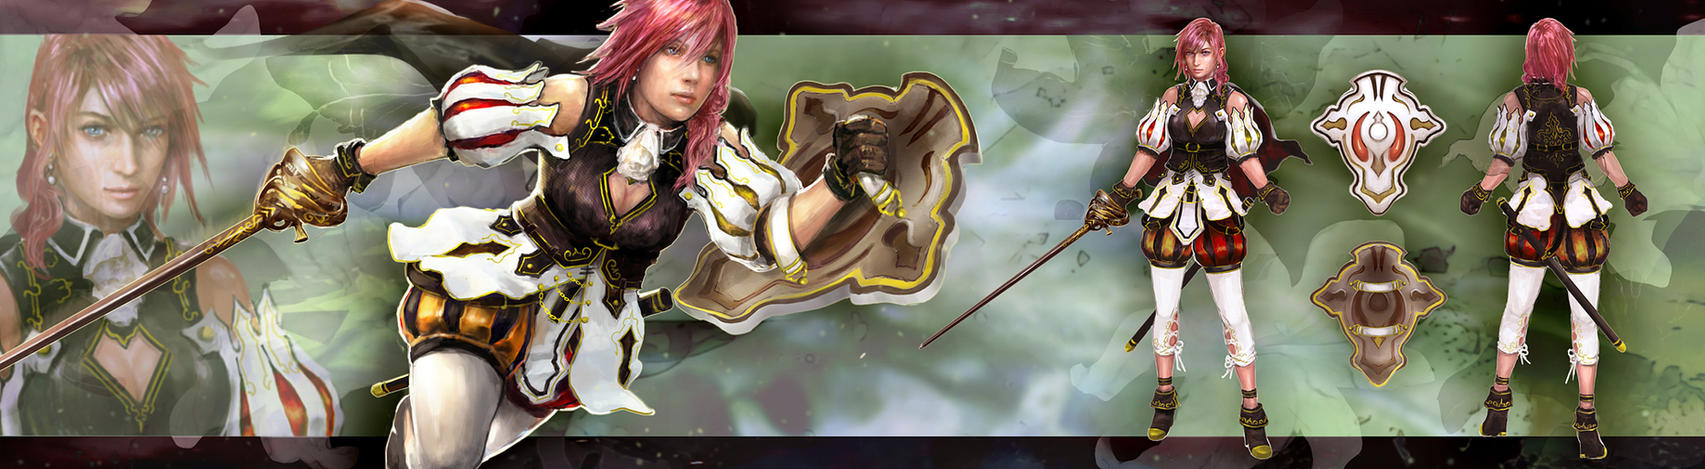 Lightning Returns by Allnamesinuse